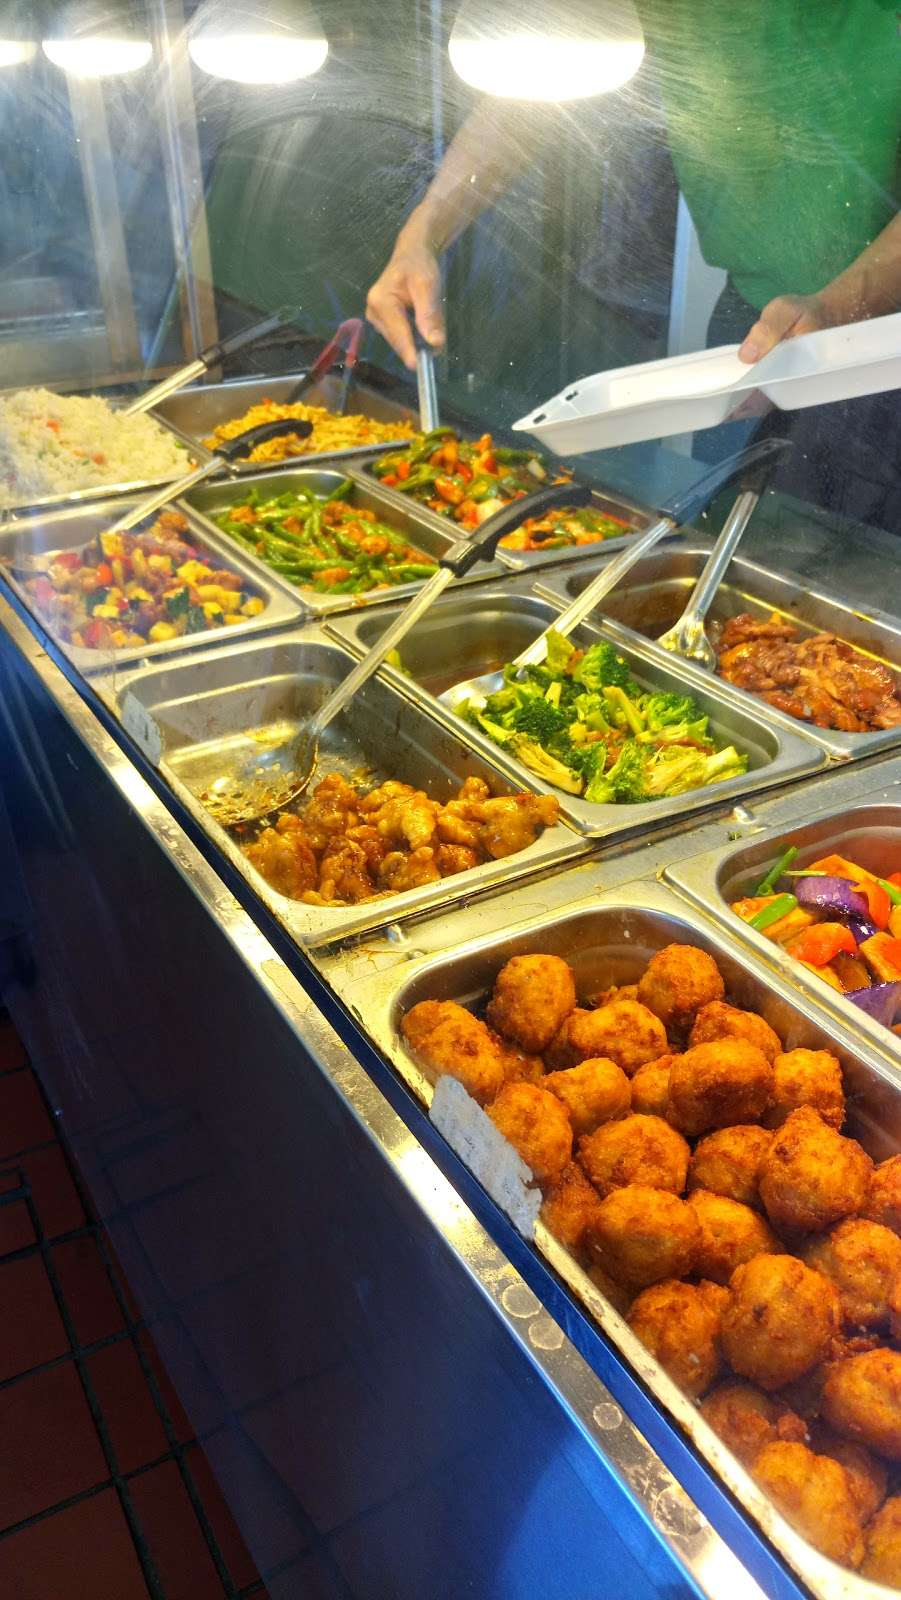 Donuts and Fast Chinese Food - restaurant  | Photo 8 of 10 | Address: 1032 E Avenida De Los Arboles, Thousand Oaks, CA 91360, USA | Phone: (805) 241-7761